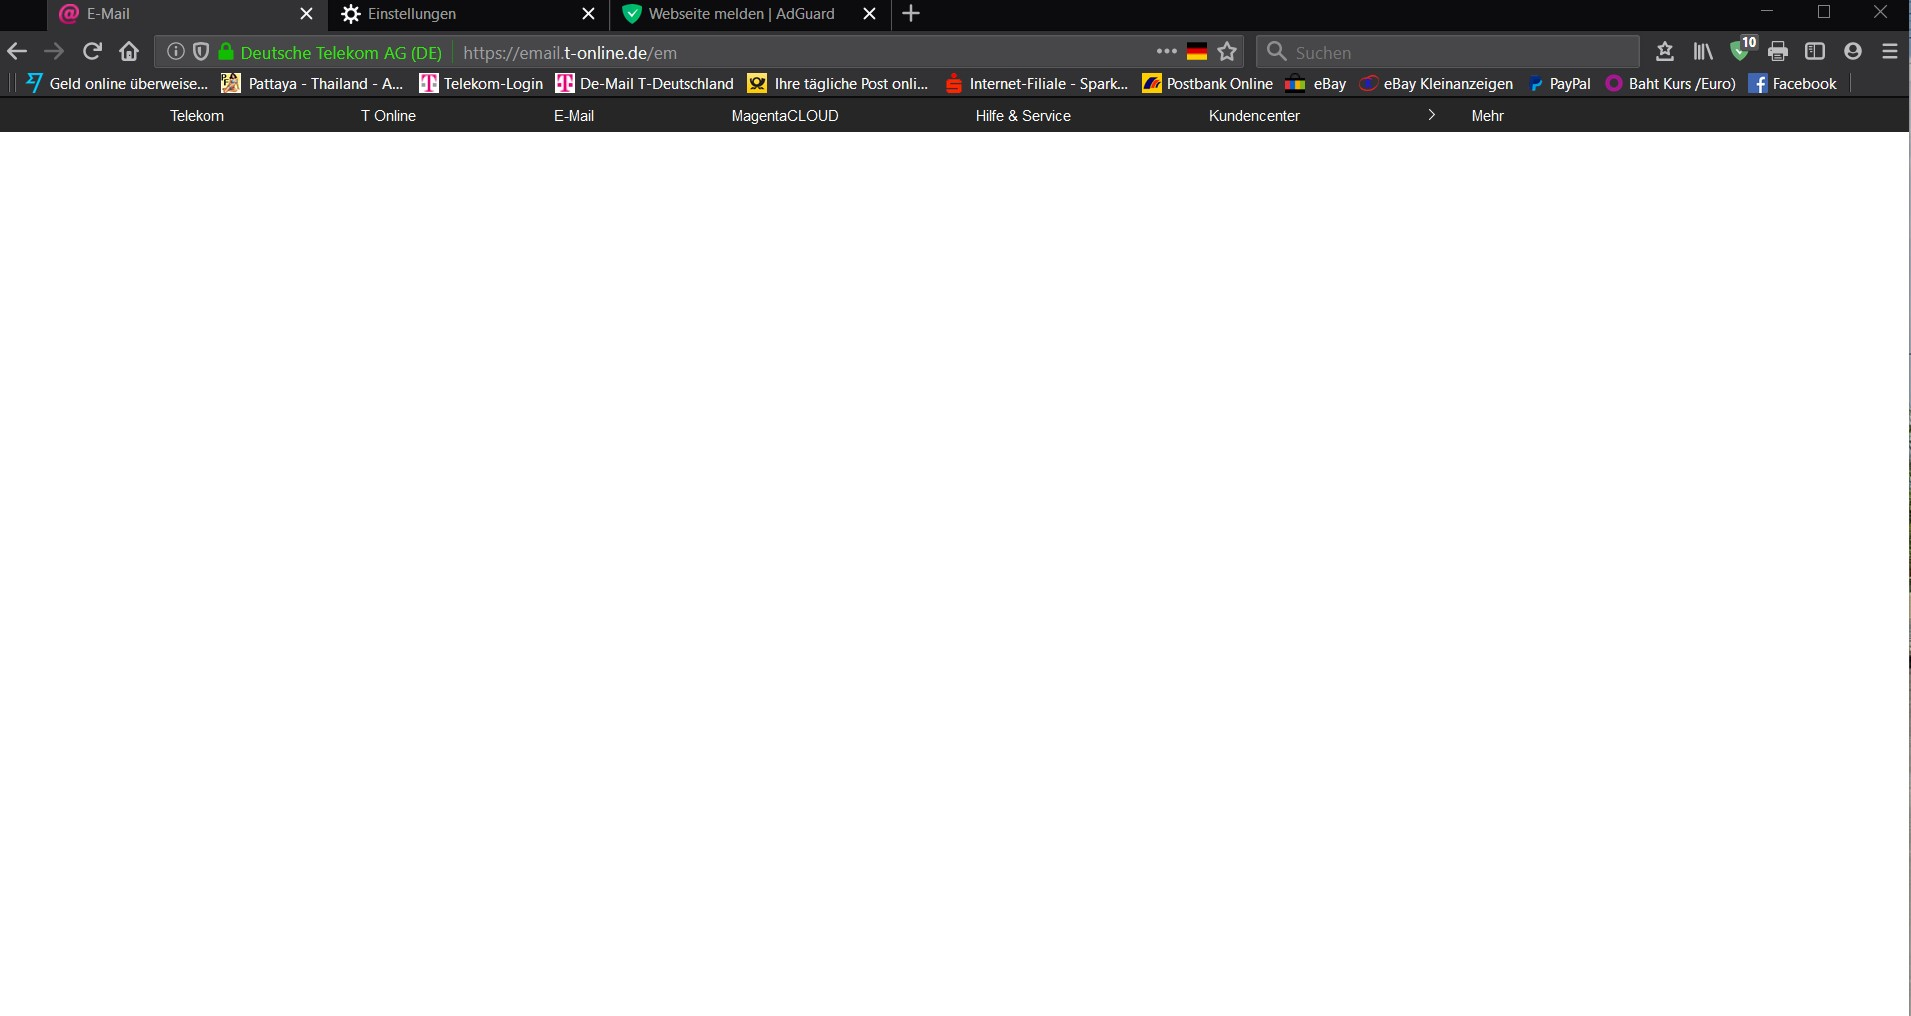 Telekom login email t-online